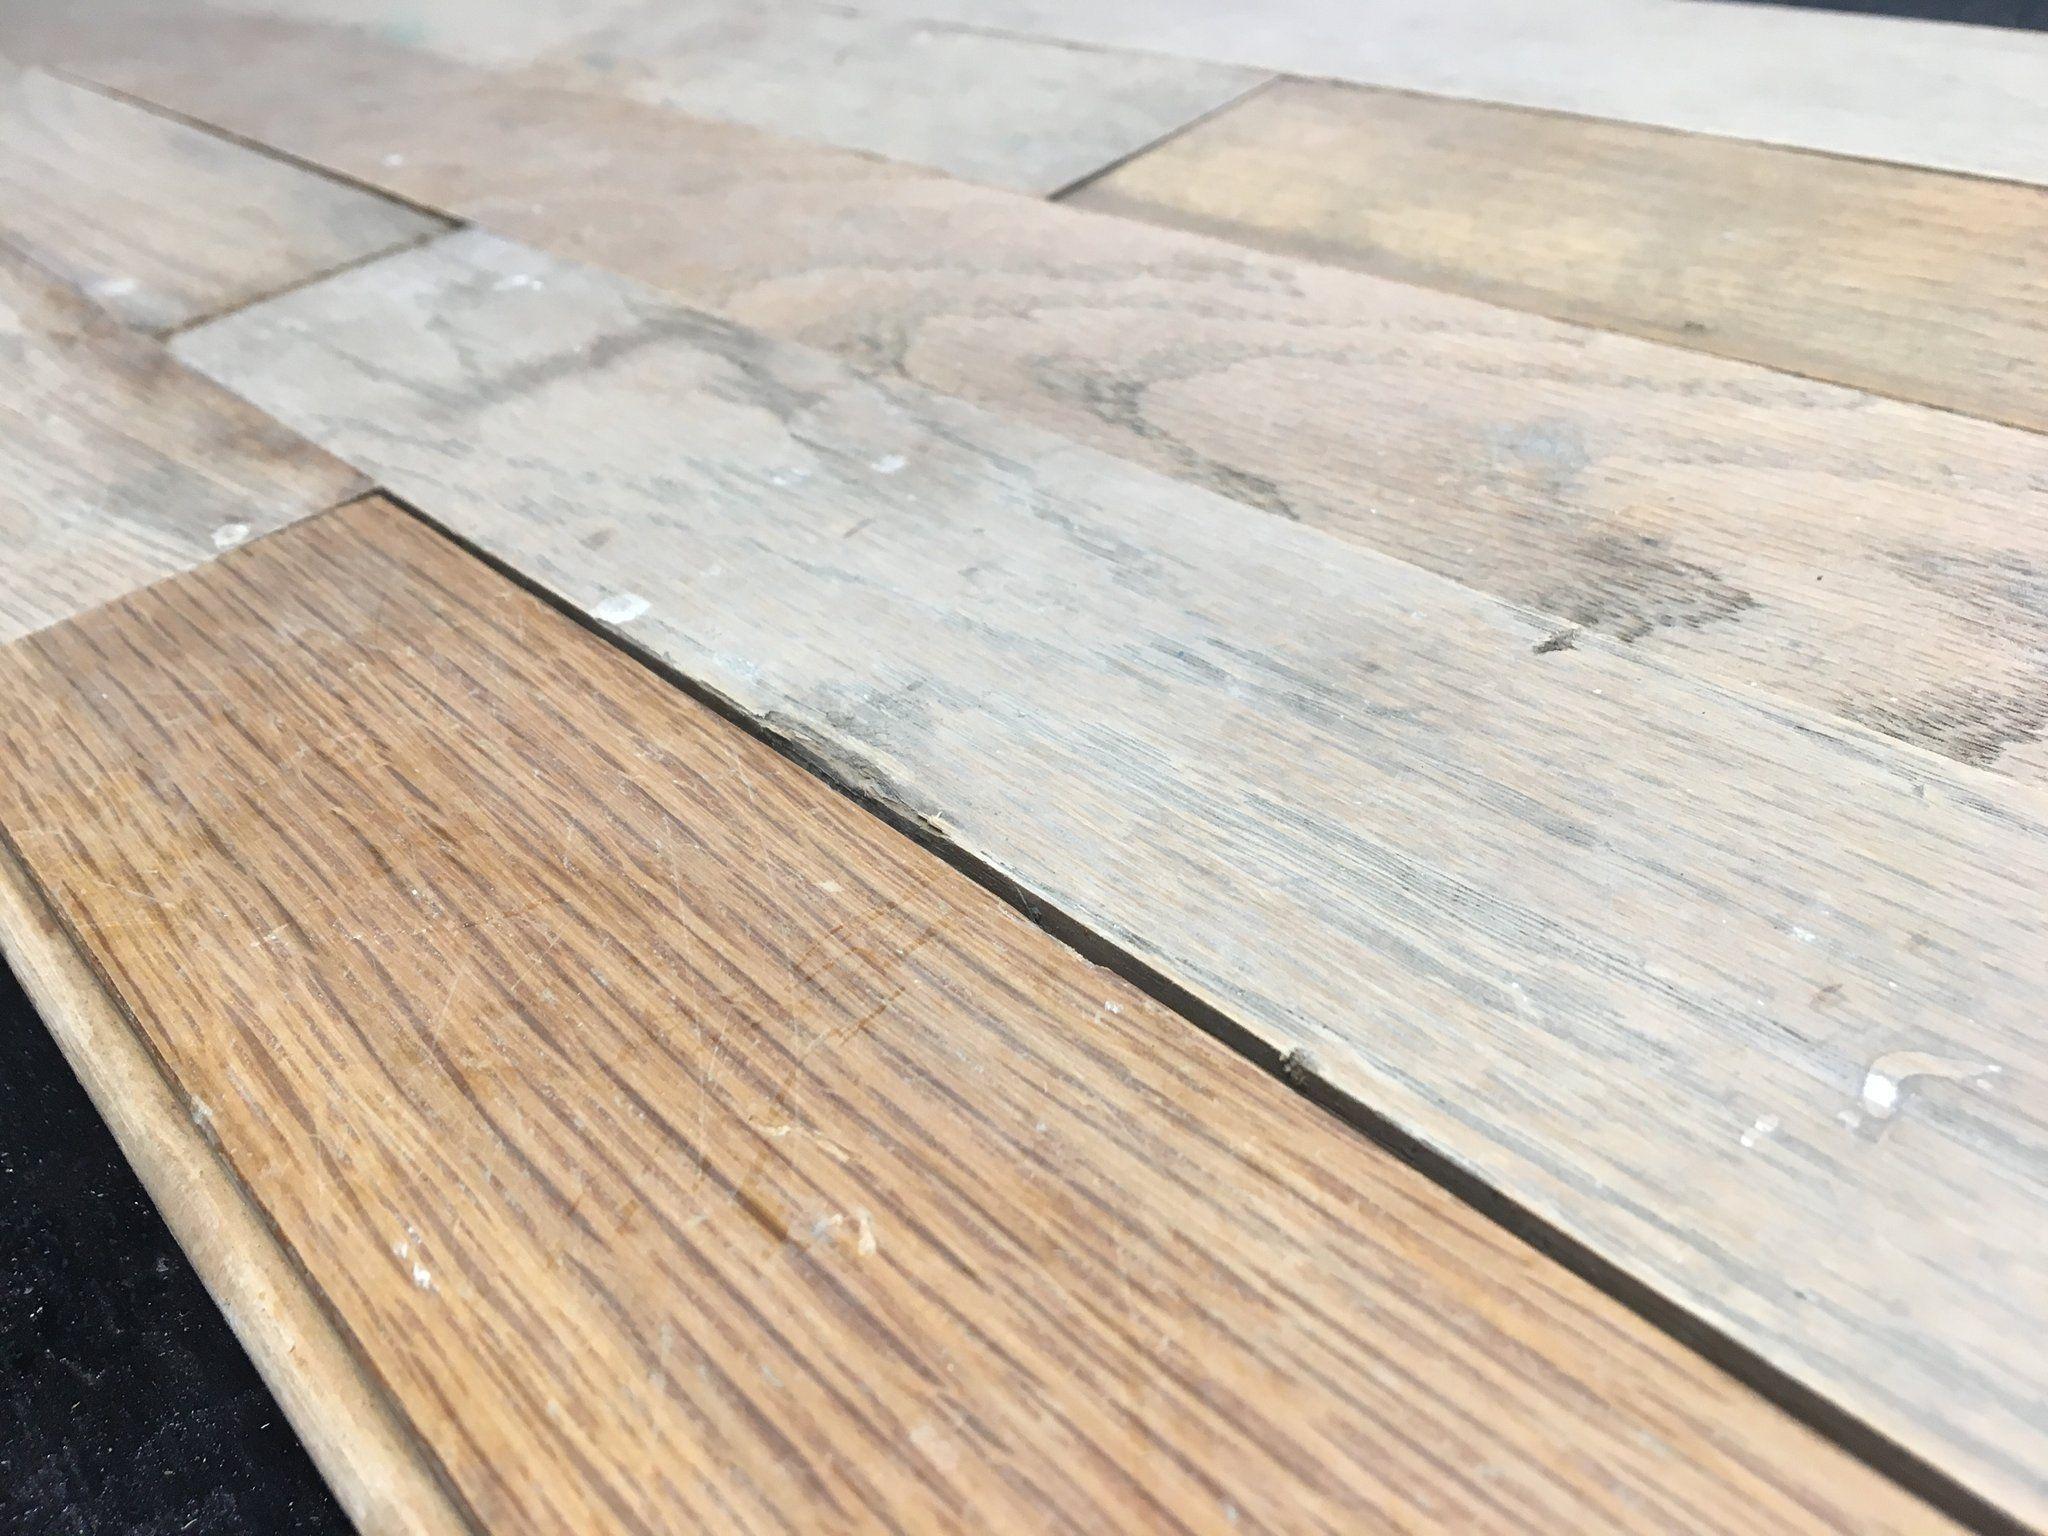 500 Sq Ft Reclaimed Oak Floor Contractor Special 2 1 4 X 3 4 Rust Belt Upcycle Llc Reclaimed Oak Flooring Reclaimed Oak Oak Floors